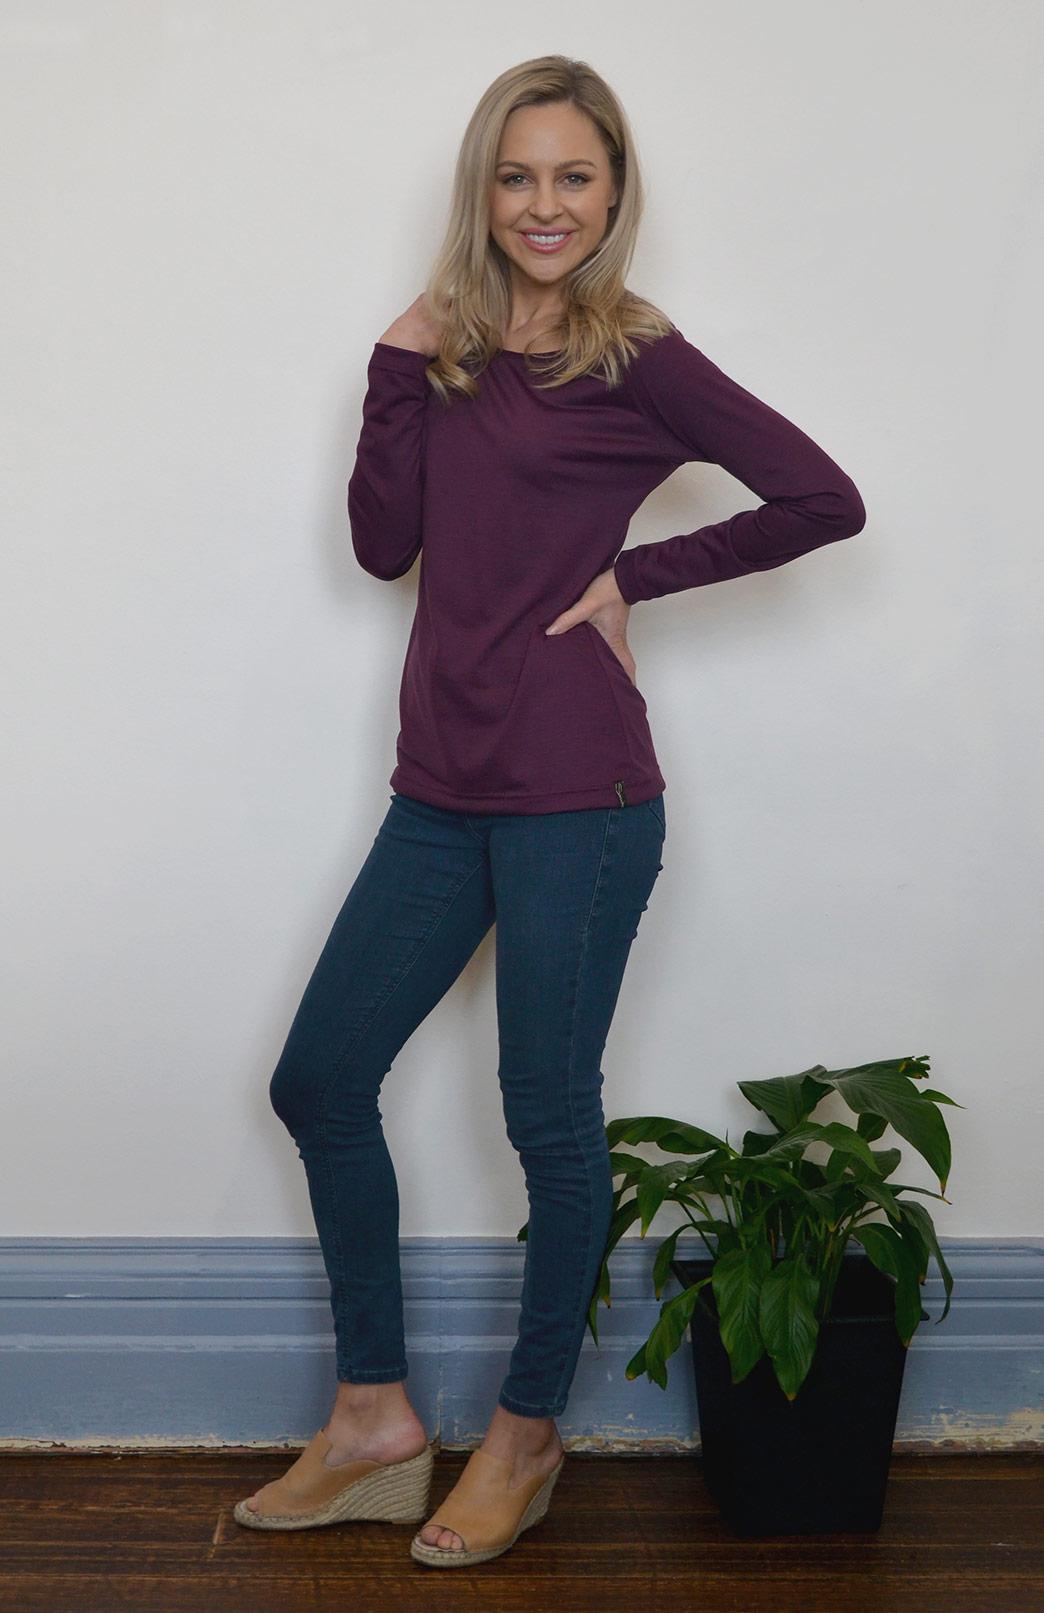 Round Neck Top (Plain) - Women's Lightweight Merino Wool Aubergine Purple Long Sleeved Round Neck Top - Smitten Merino Tasmania Australia